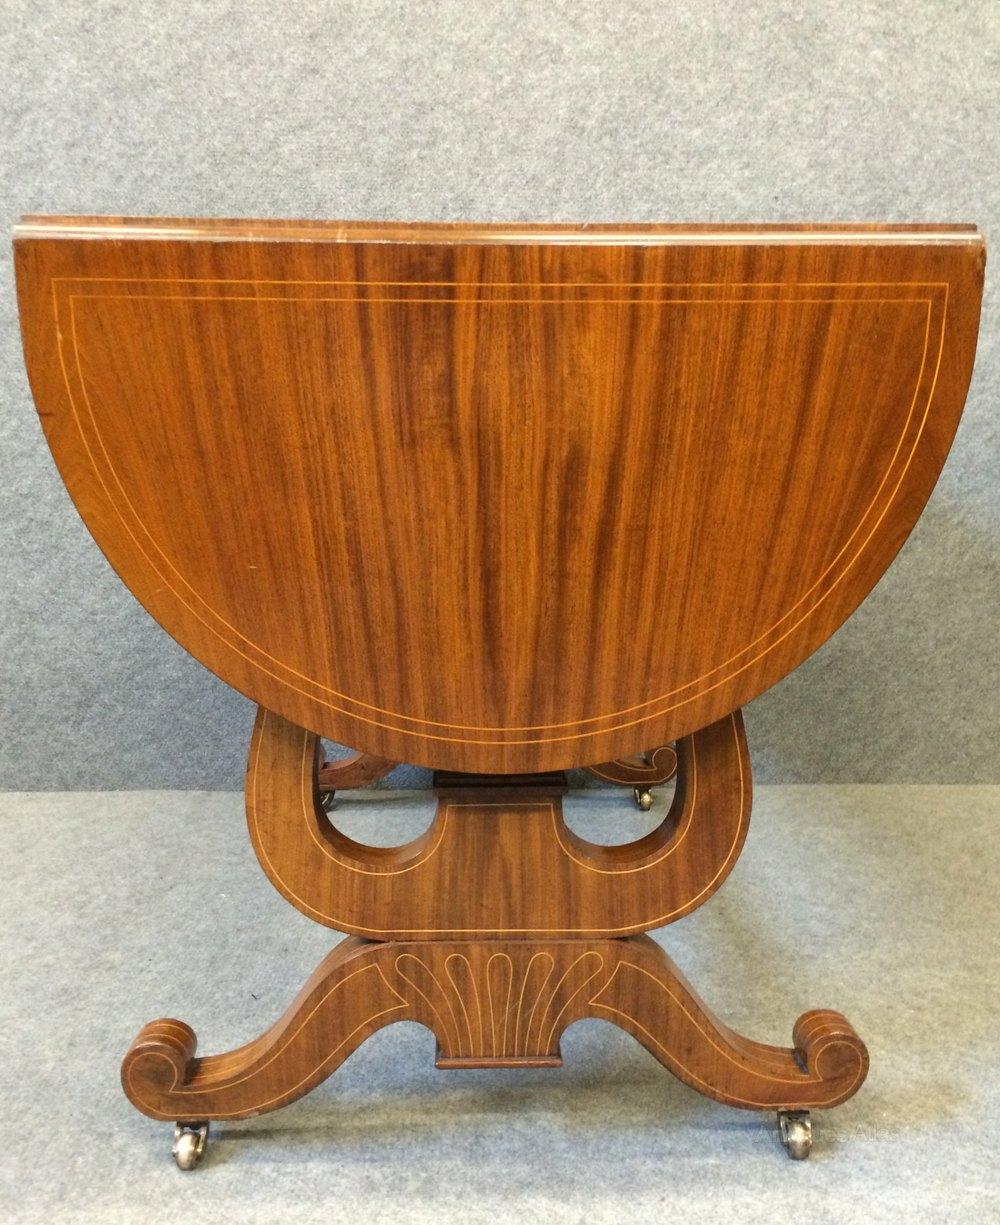 Antique sofa table - Biedermeier Sofa Table Antique Occasional Tables